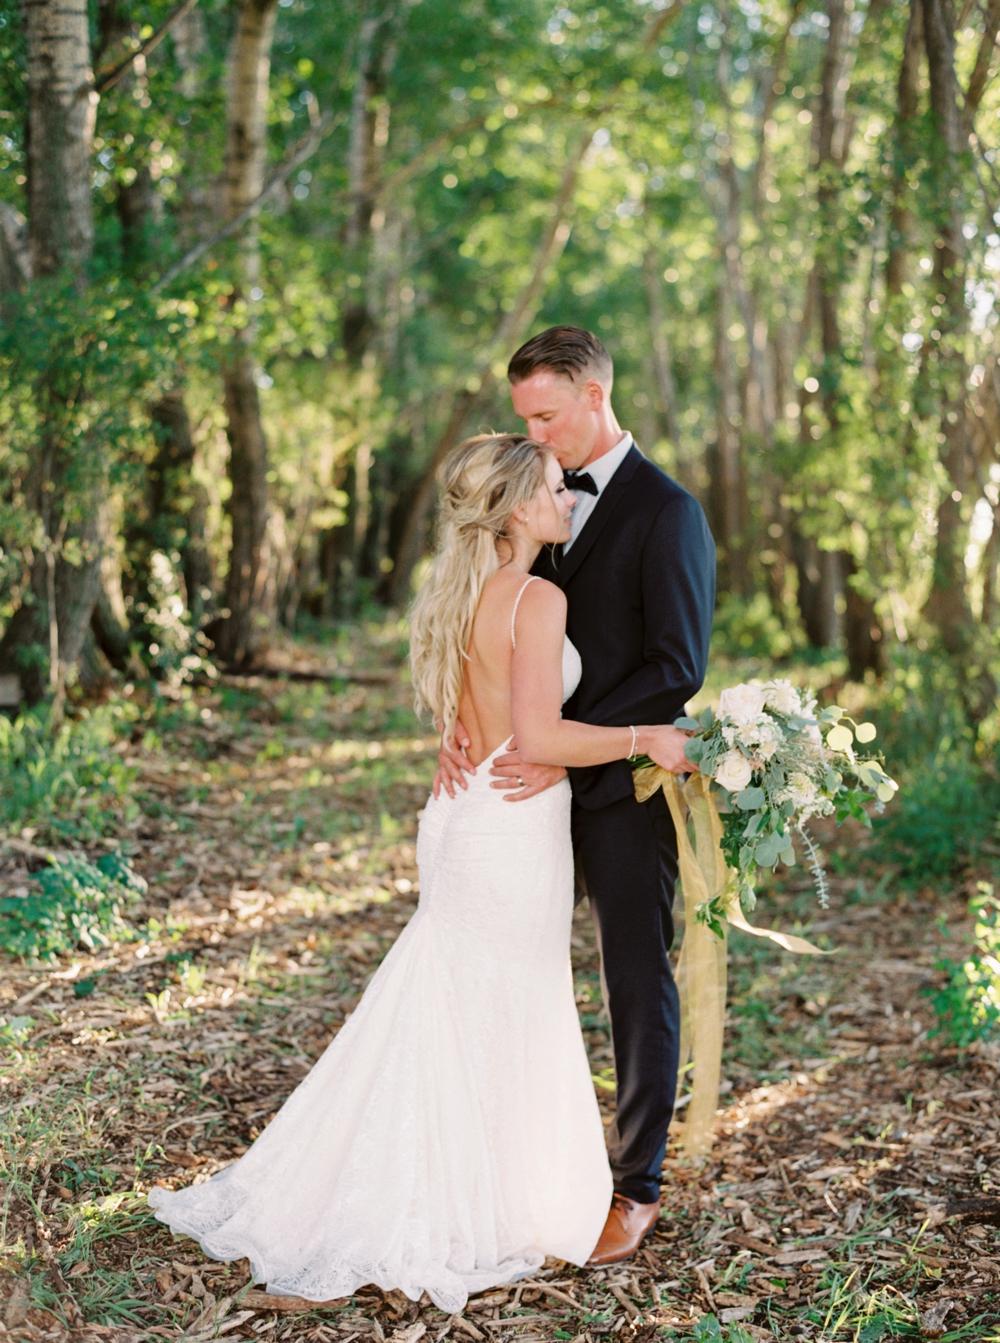 Calgary Wedding Photographers | Willow Lane Barn Olds Wedding | Alberta Wedding Photography | Outdoor Wedding Ceremony | Rustic Wedding | Fine Art Film Photographer | Neutral Color Palette